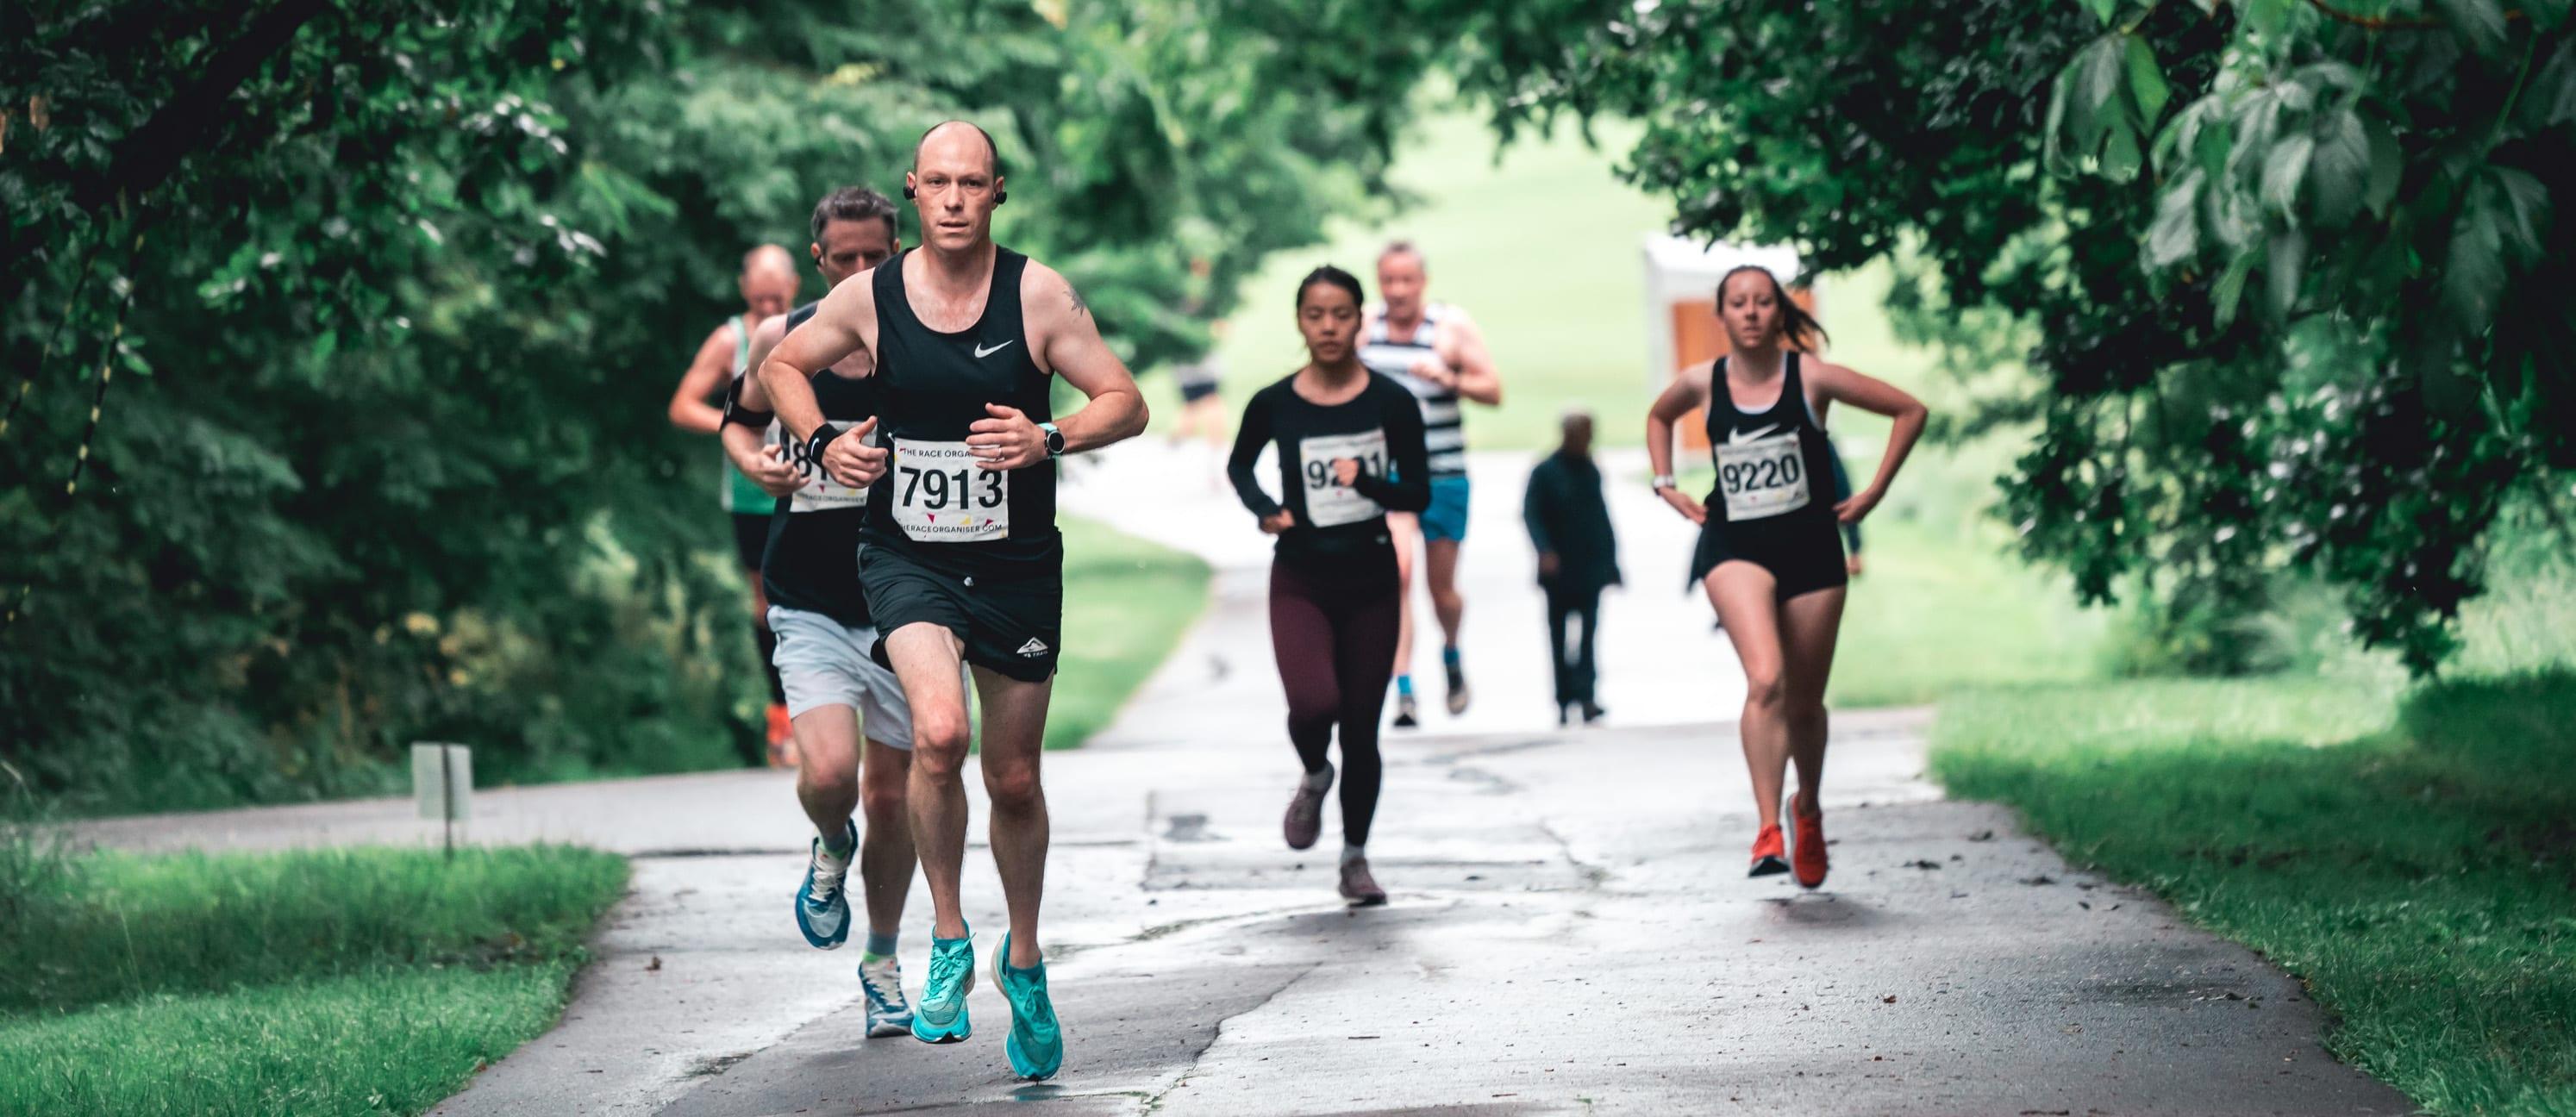 The Regent's Park Half Marathon (Intermediate)